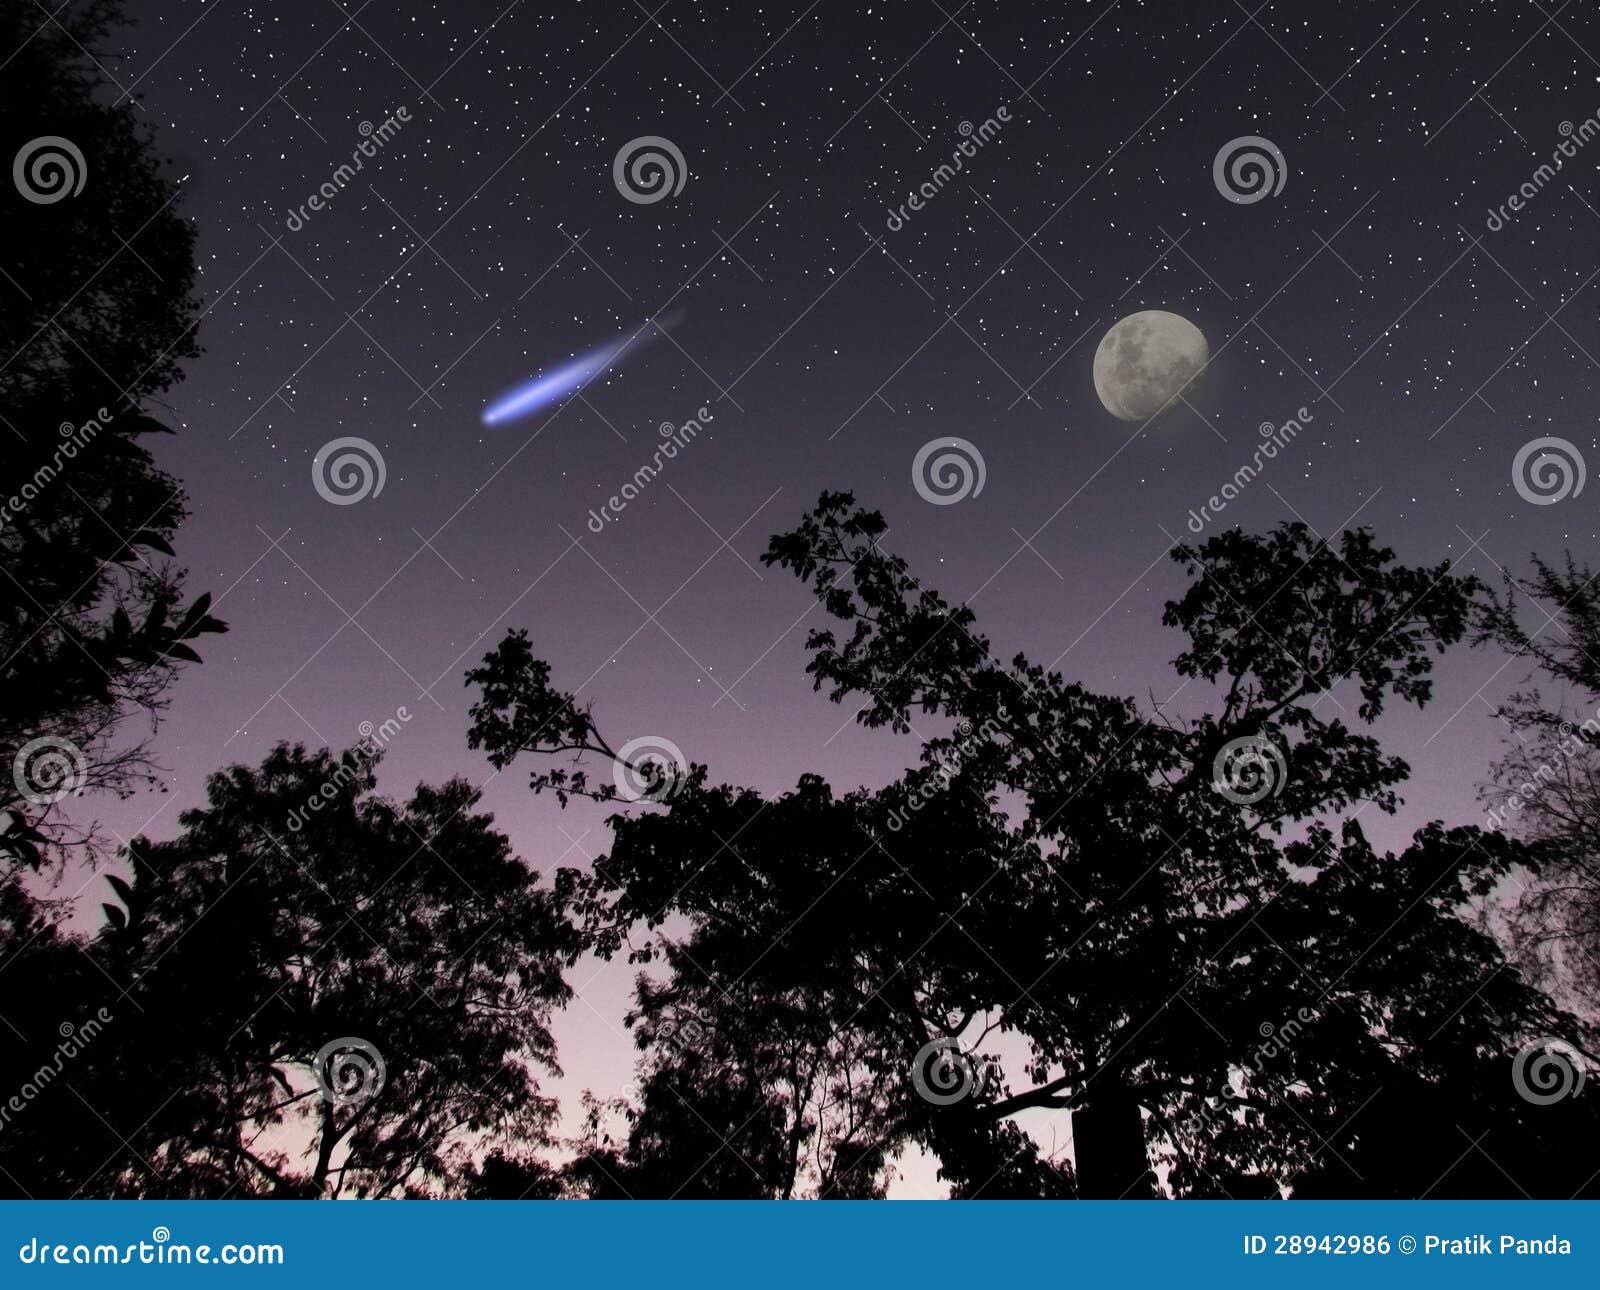 Asteroïde ou comète DA14 dans la scène de ciel nocturne